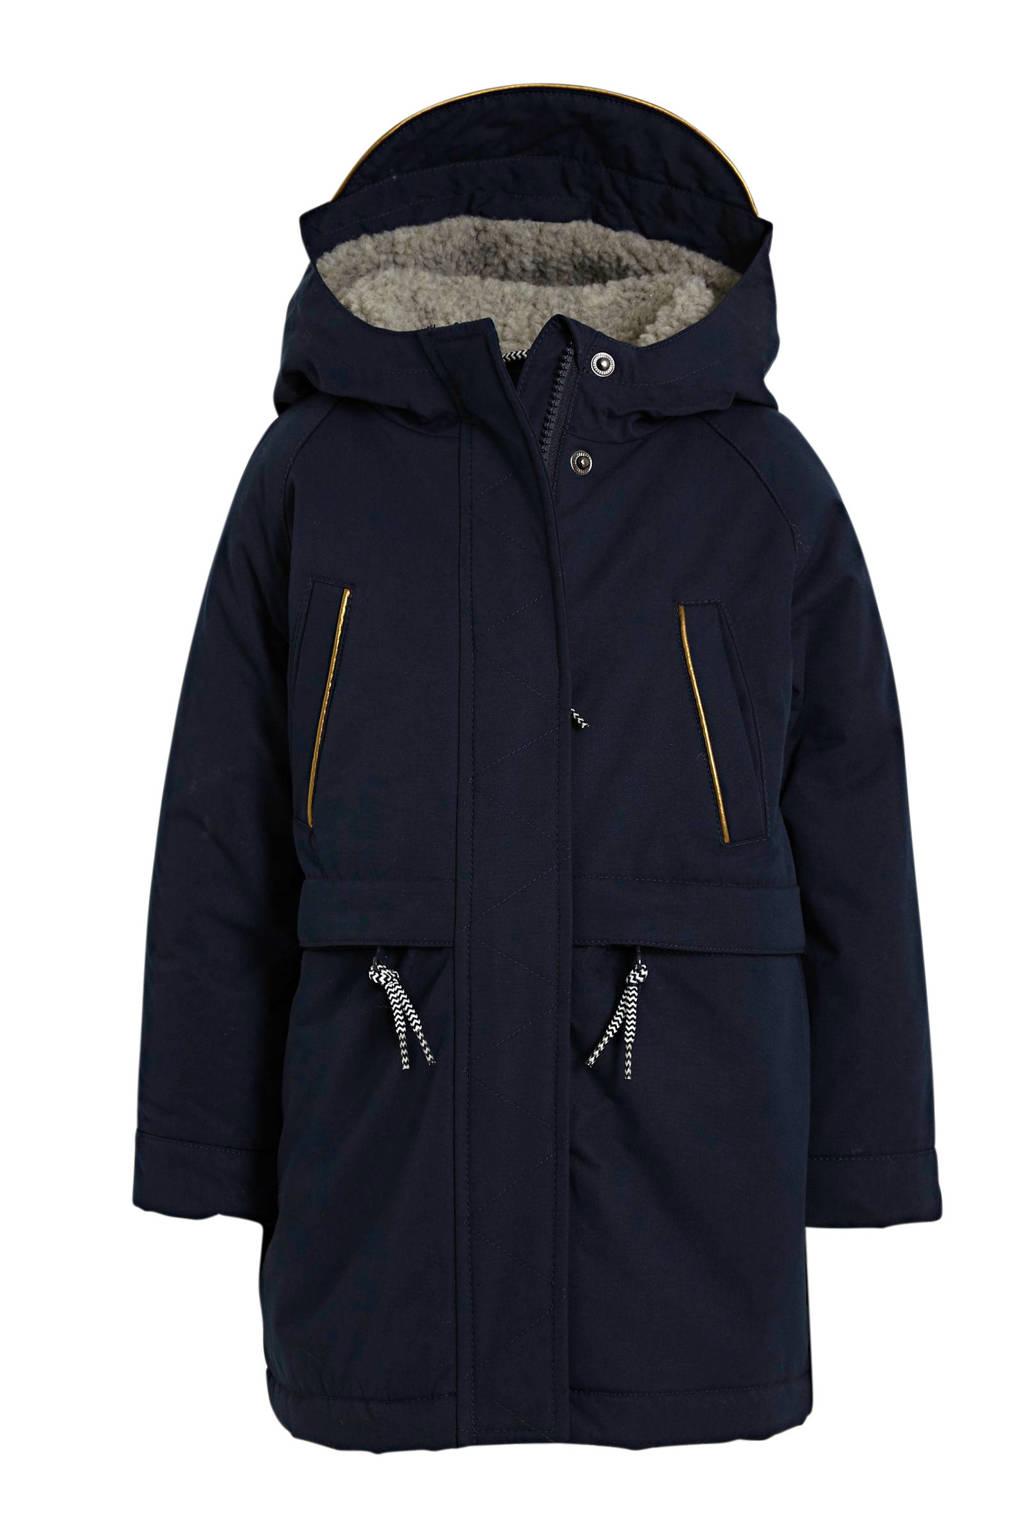 Noppies gewatteerde winterjas Virgina donkerblauw, Donkerblauw